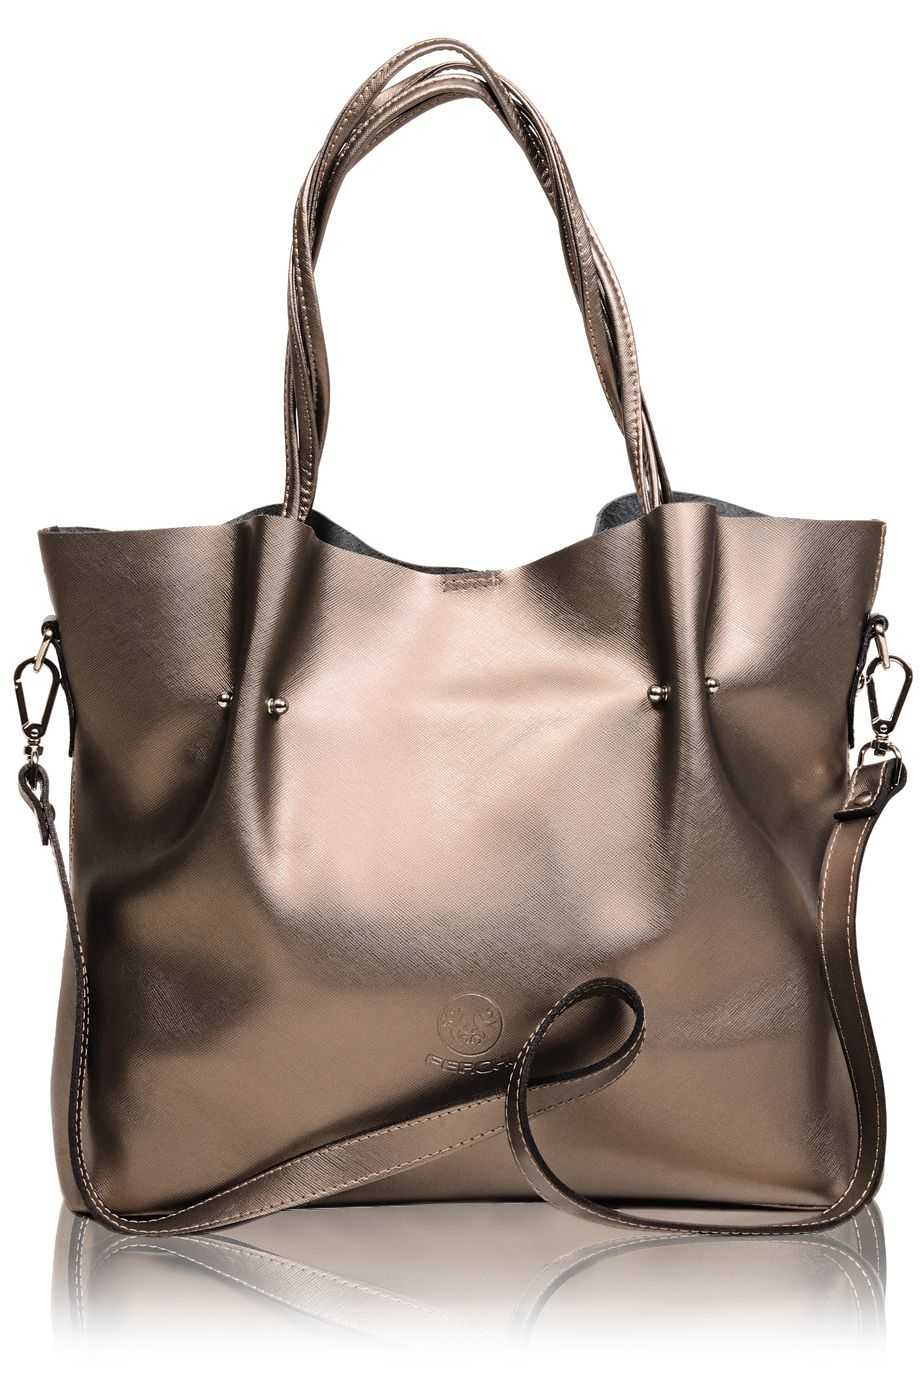 FERCHI IZIDA Bronze Leather Tote - ACCESSORIES   BAGS   TOTES   Day   PRET-A-BEAUTE.COM